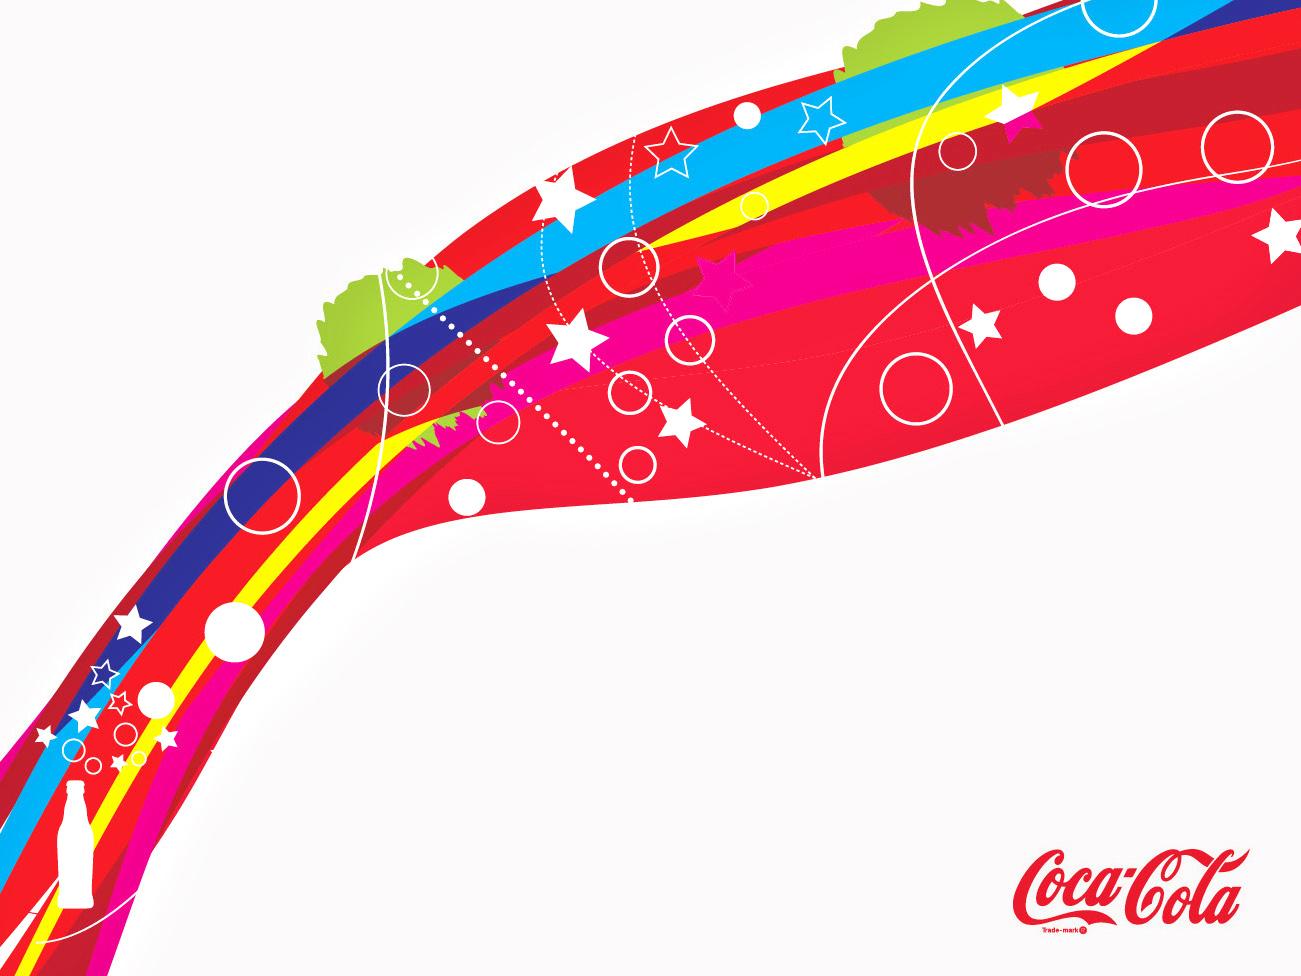 coca-cola-ad-landsc1 Semplice